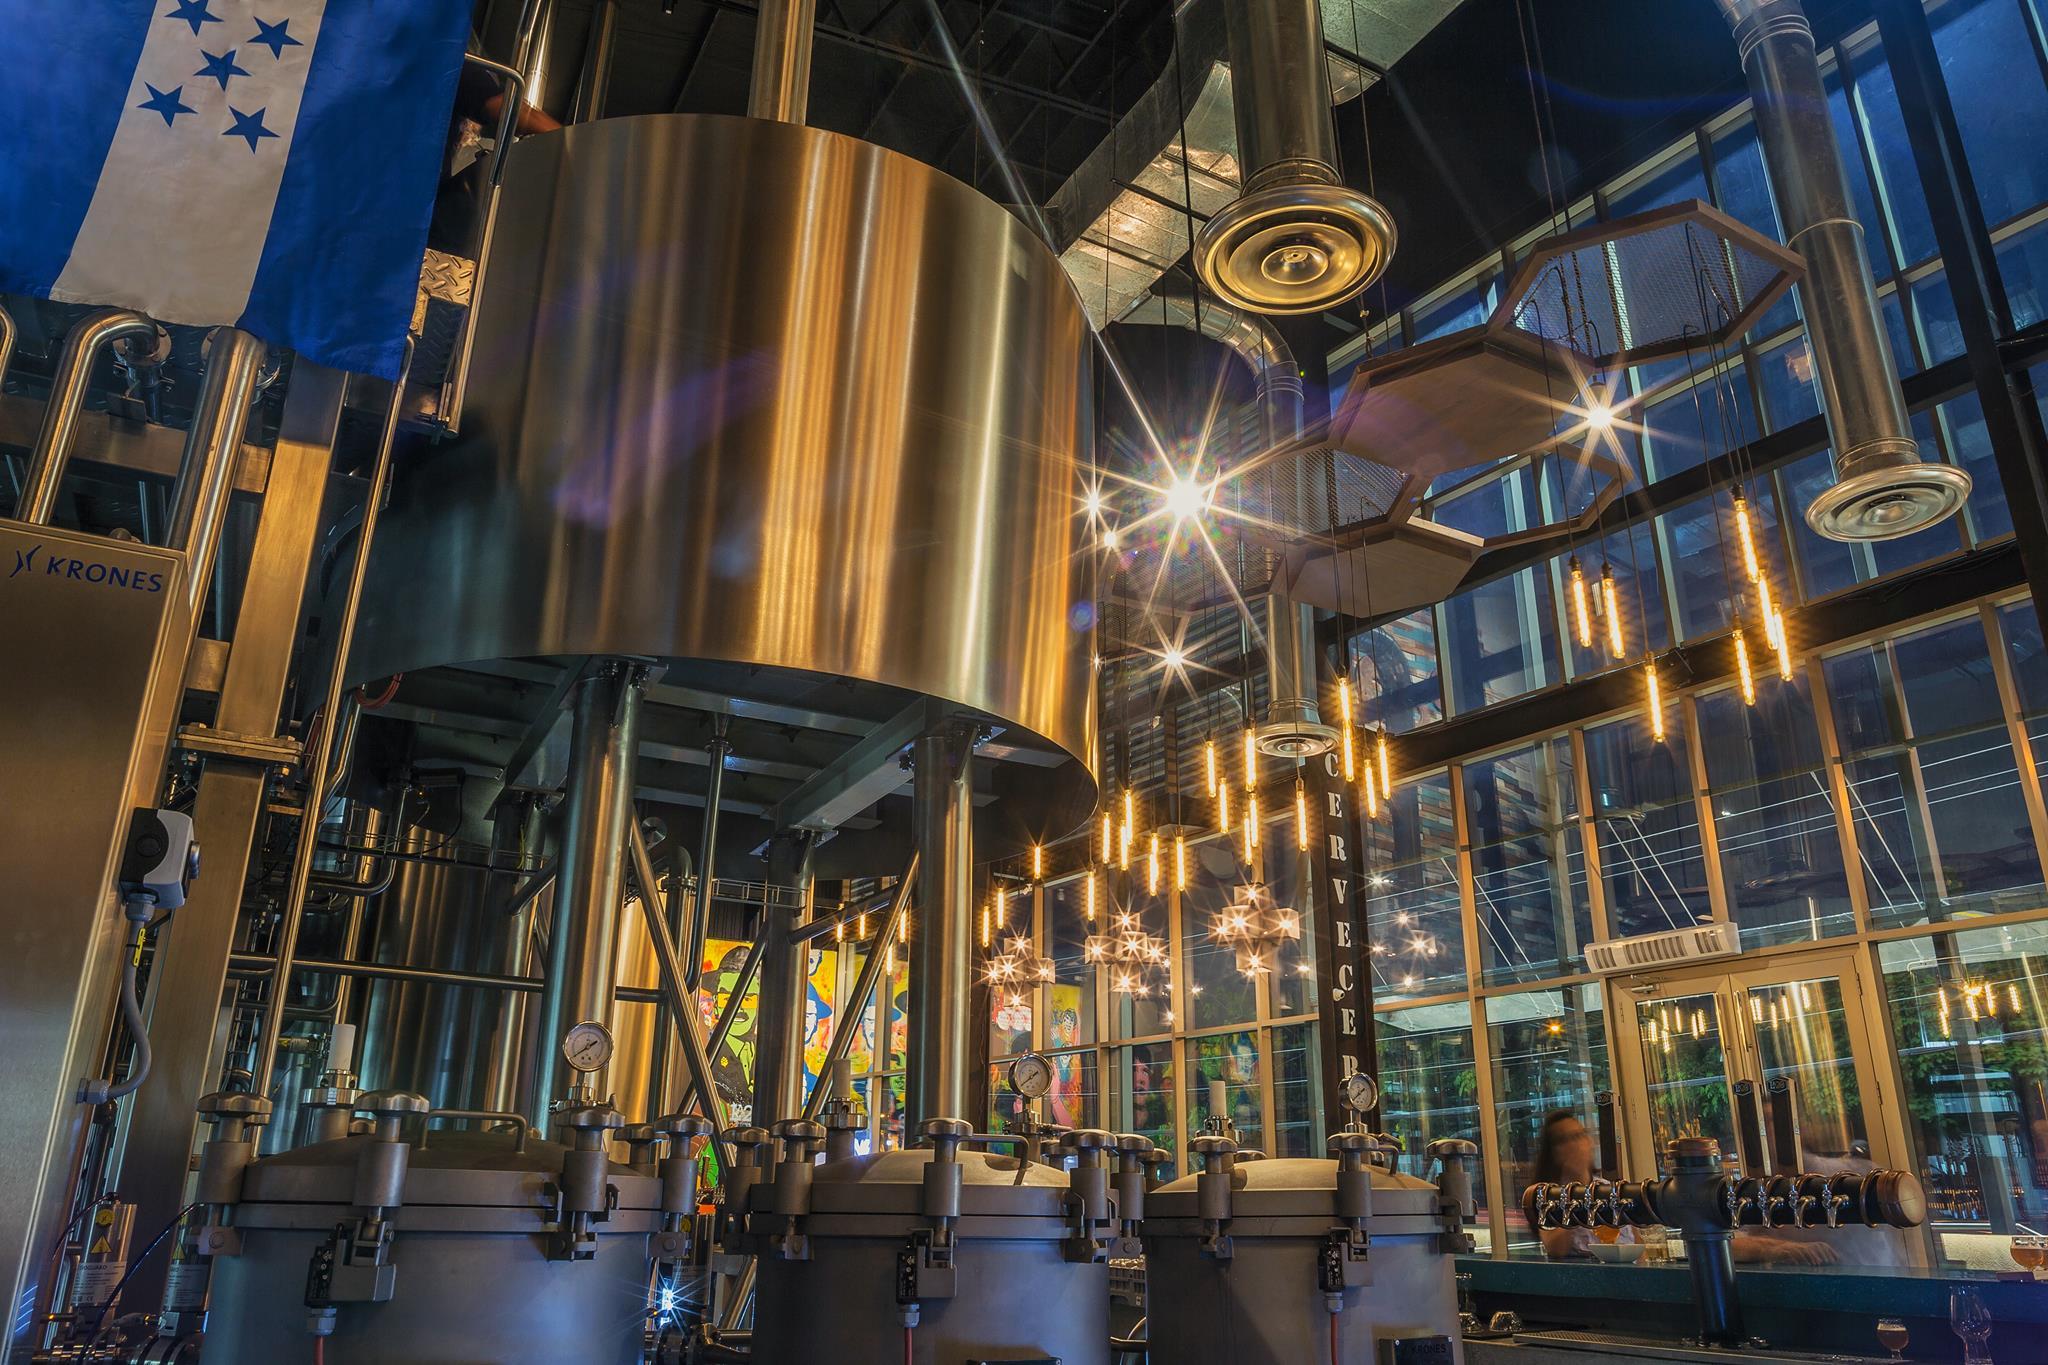 Tour en Cervecería LA20, fabrica de cerveza artesanal